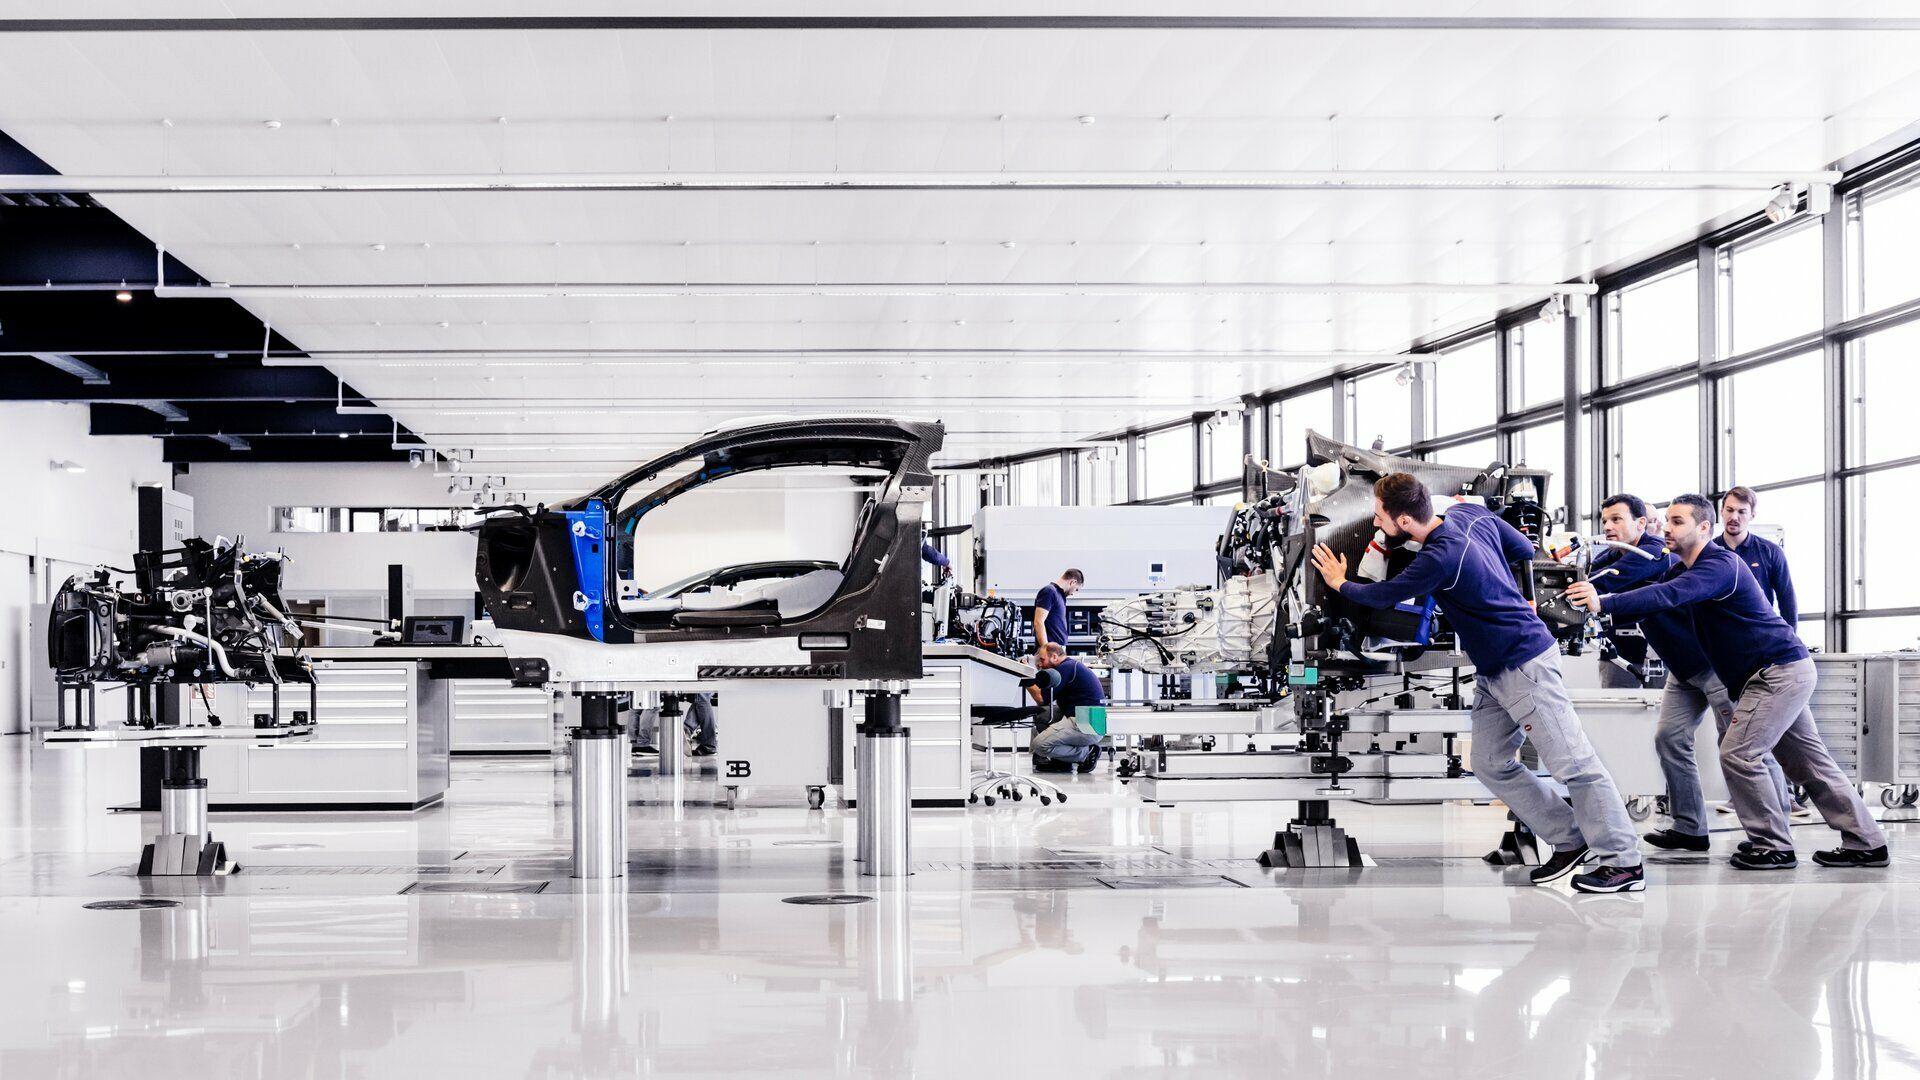 ¿Cómo se fabrica un automóvil de serie limitada? (VI)